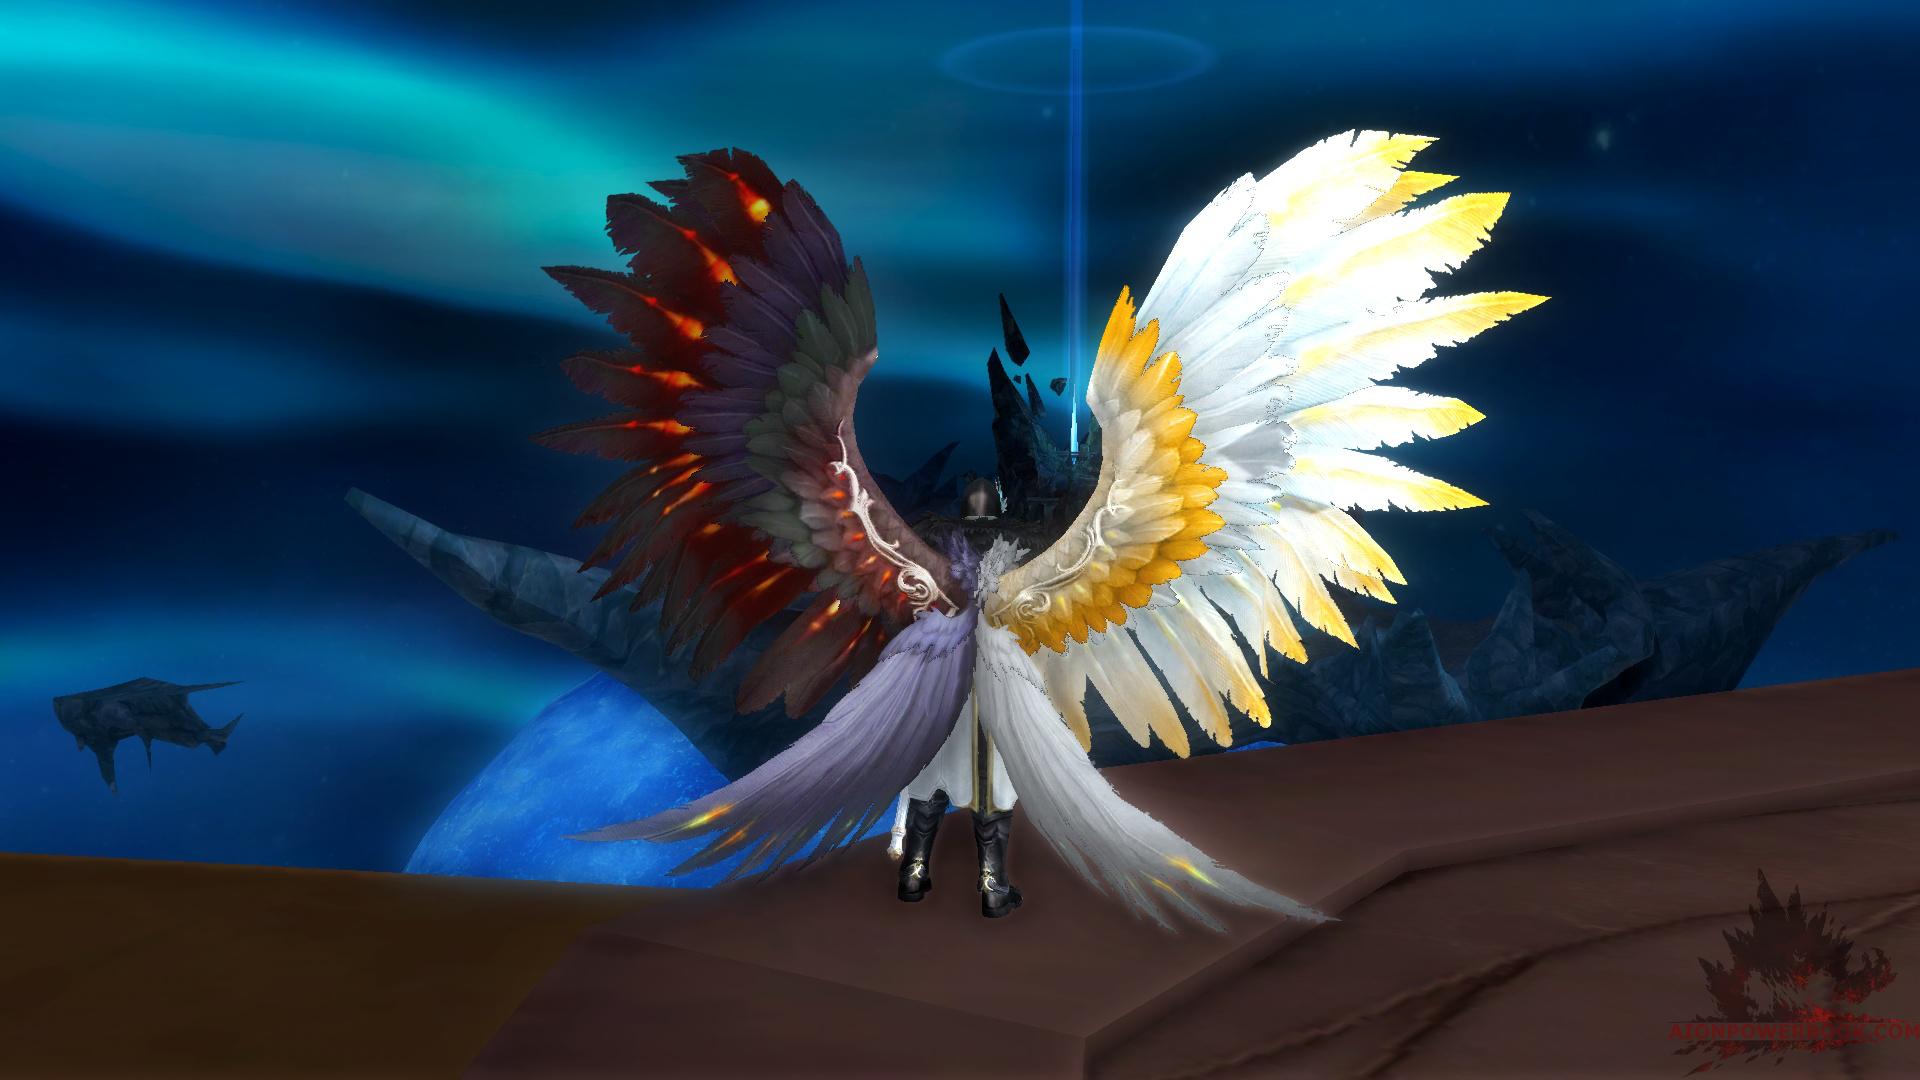 wing_cash_mono_01_2.jpg&key=c6109a5644ec